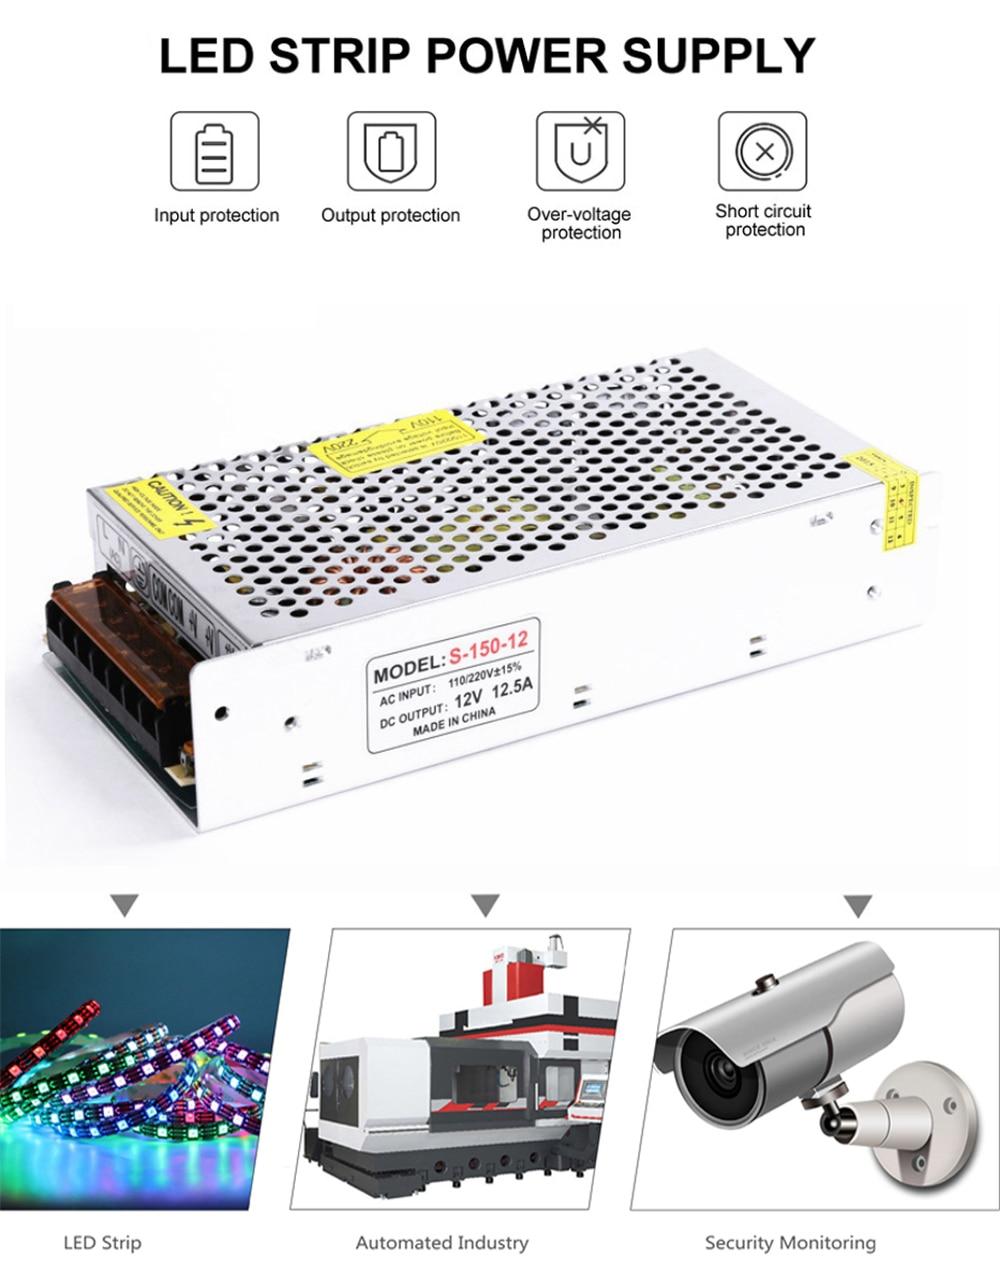 DC12V Switch LED Power Supply Transformer For WS2811 WS2815 1A 2A 3A 5A 6.5A 8.5A 10A 12.5A 16.5A 20A 25A 30A 40A 50A 60A